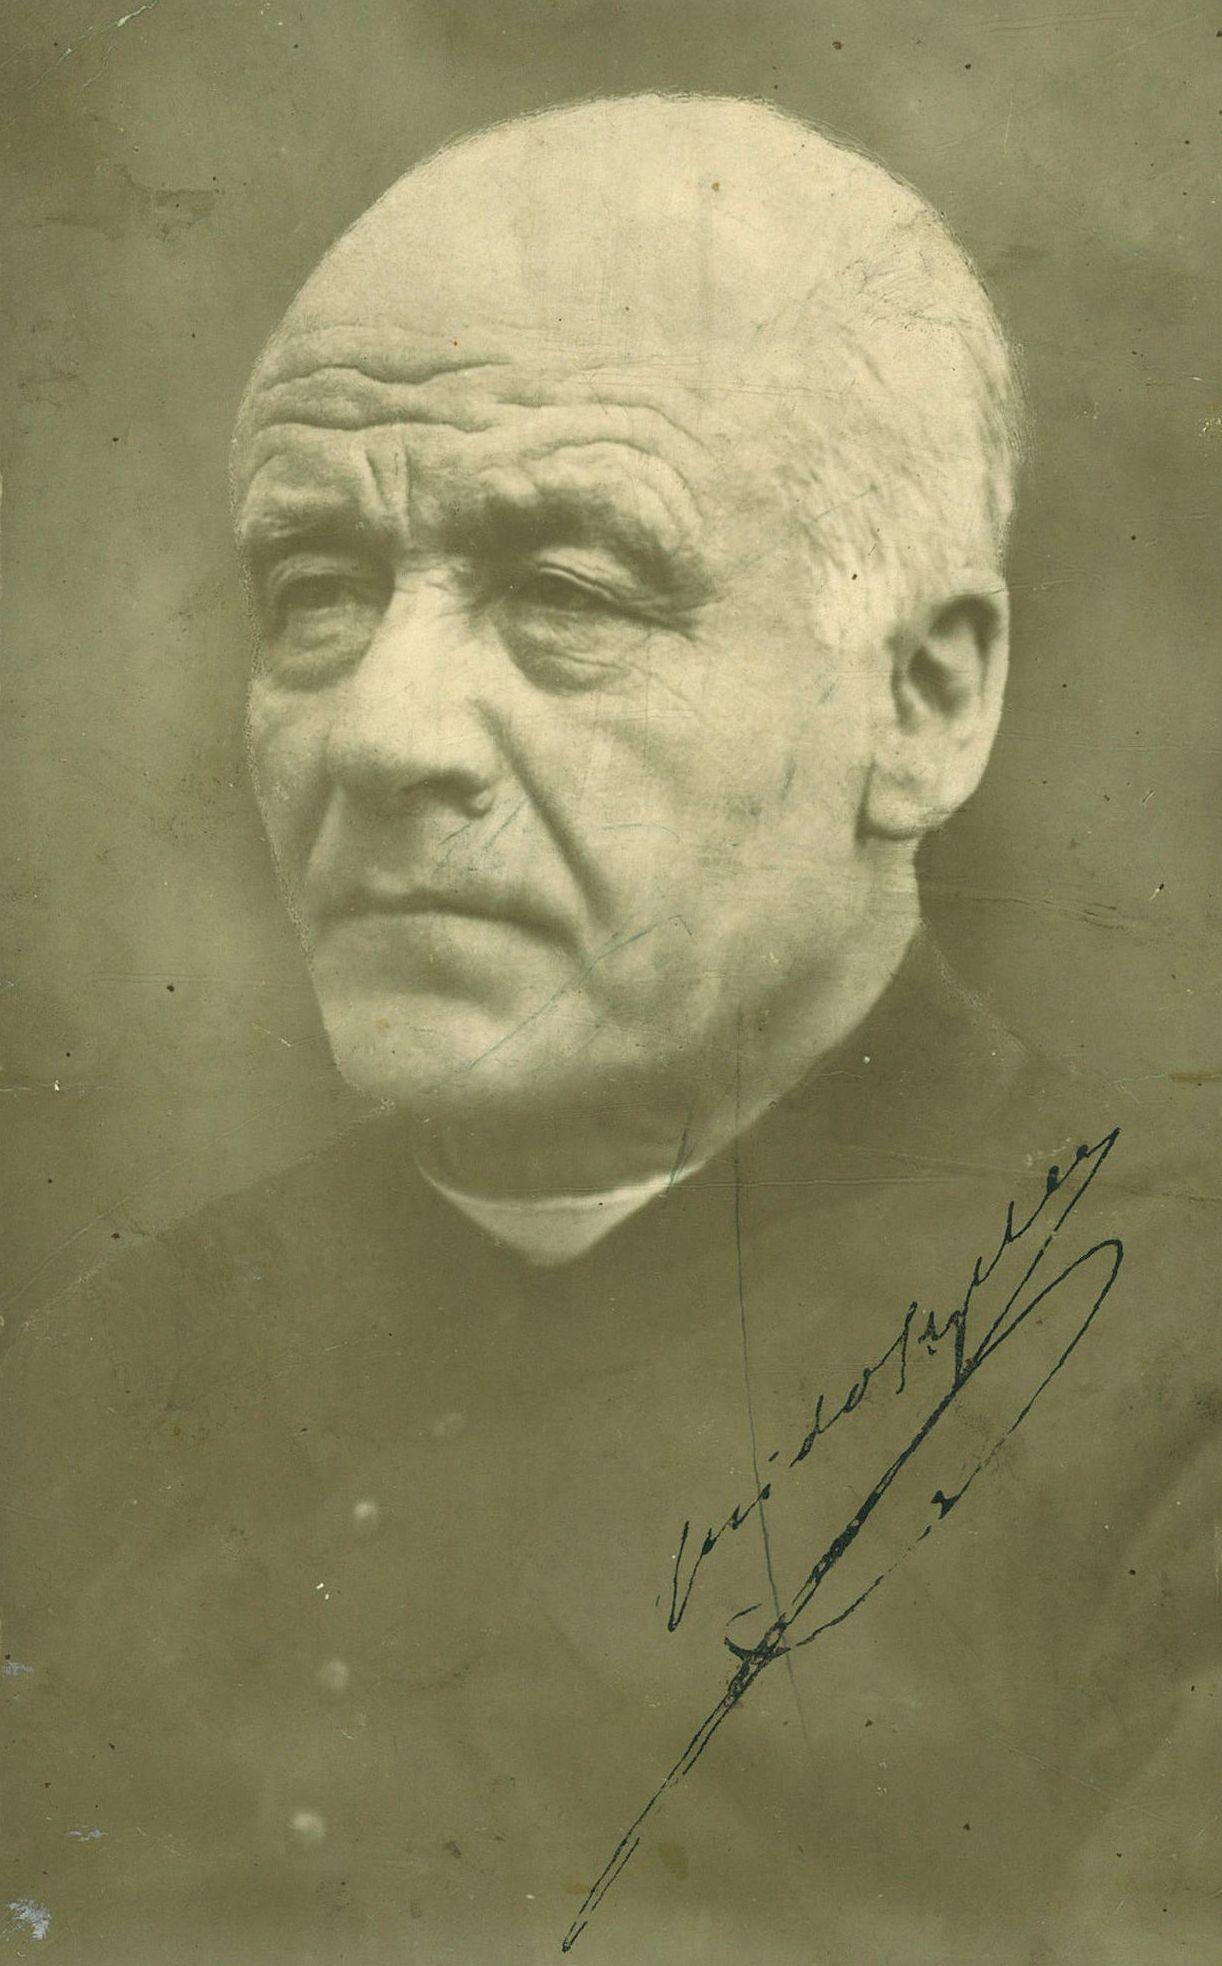 Guido Gezelle